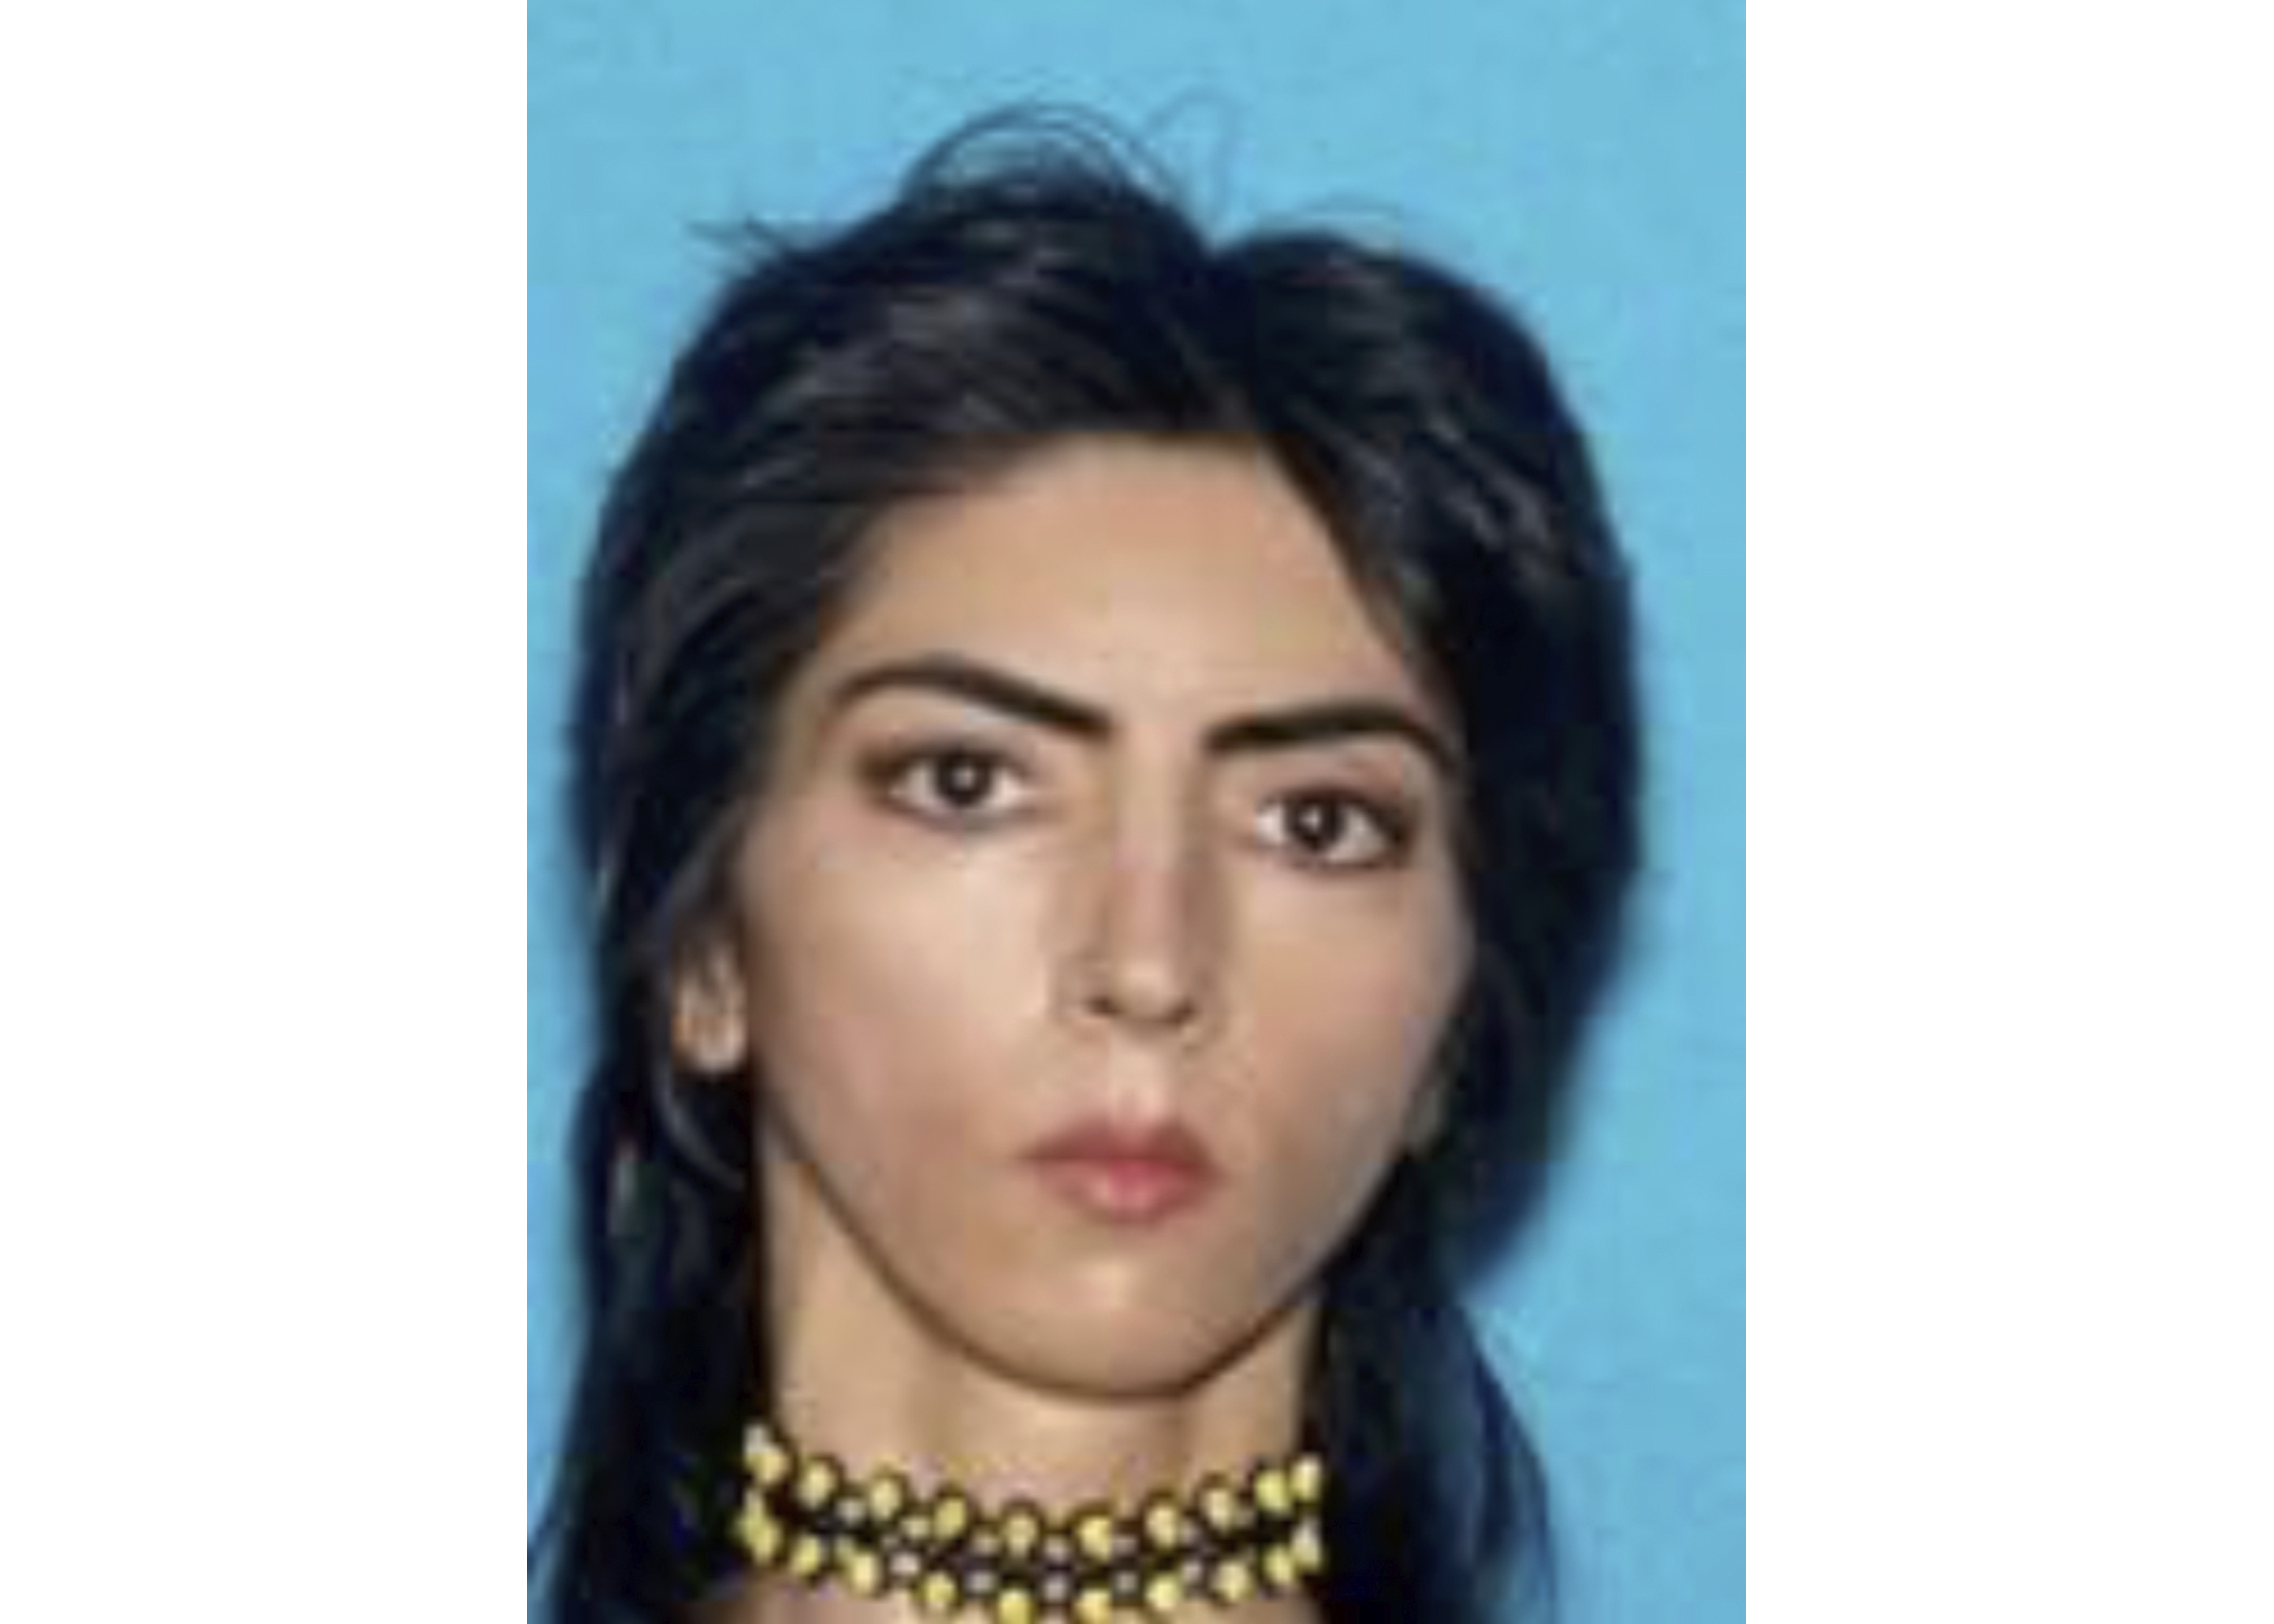 San Bruno, CA - YouTube Attacker Was Vegan Activist Who Accused